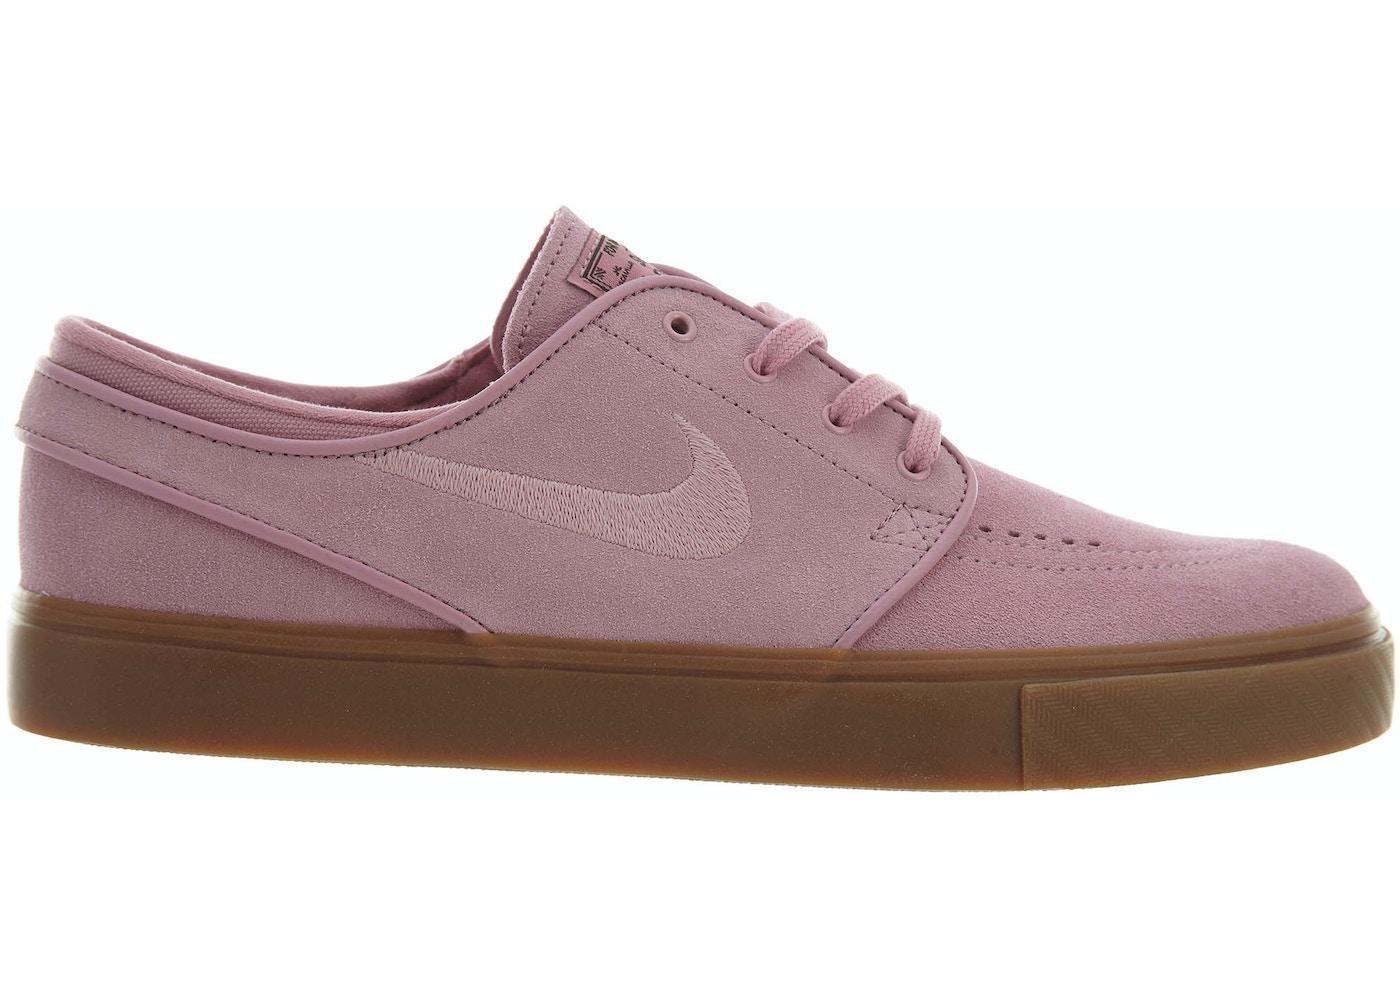 5d8eb9c0a Nike Zoom Stefan Janoski Elemental Pink Elemental Pink - 333824-604